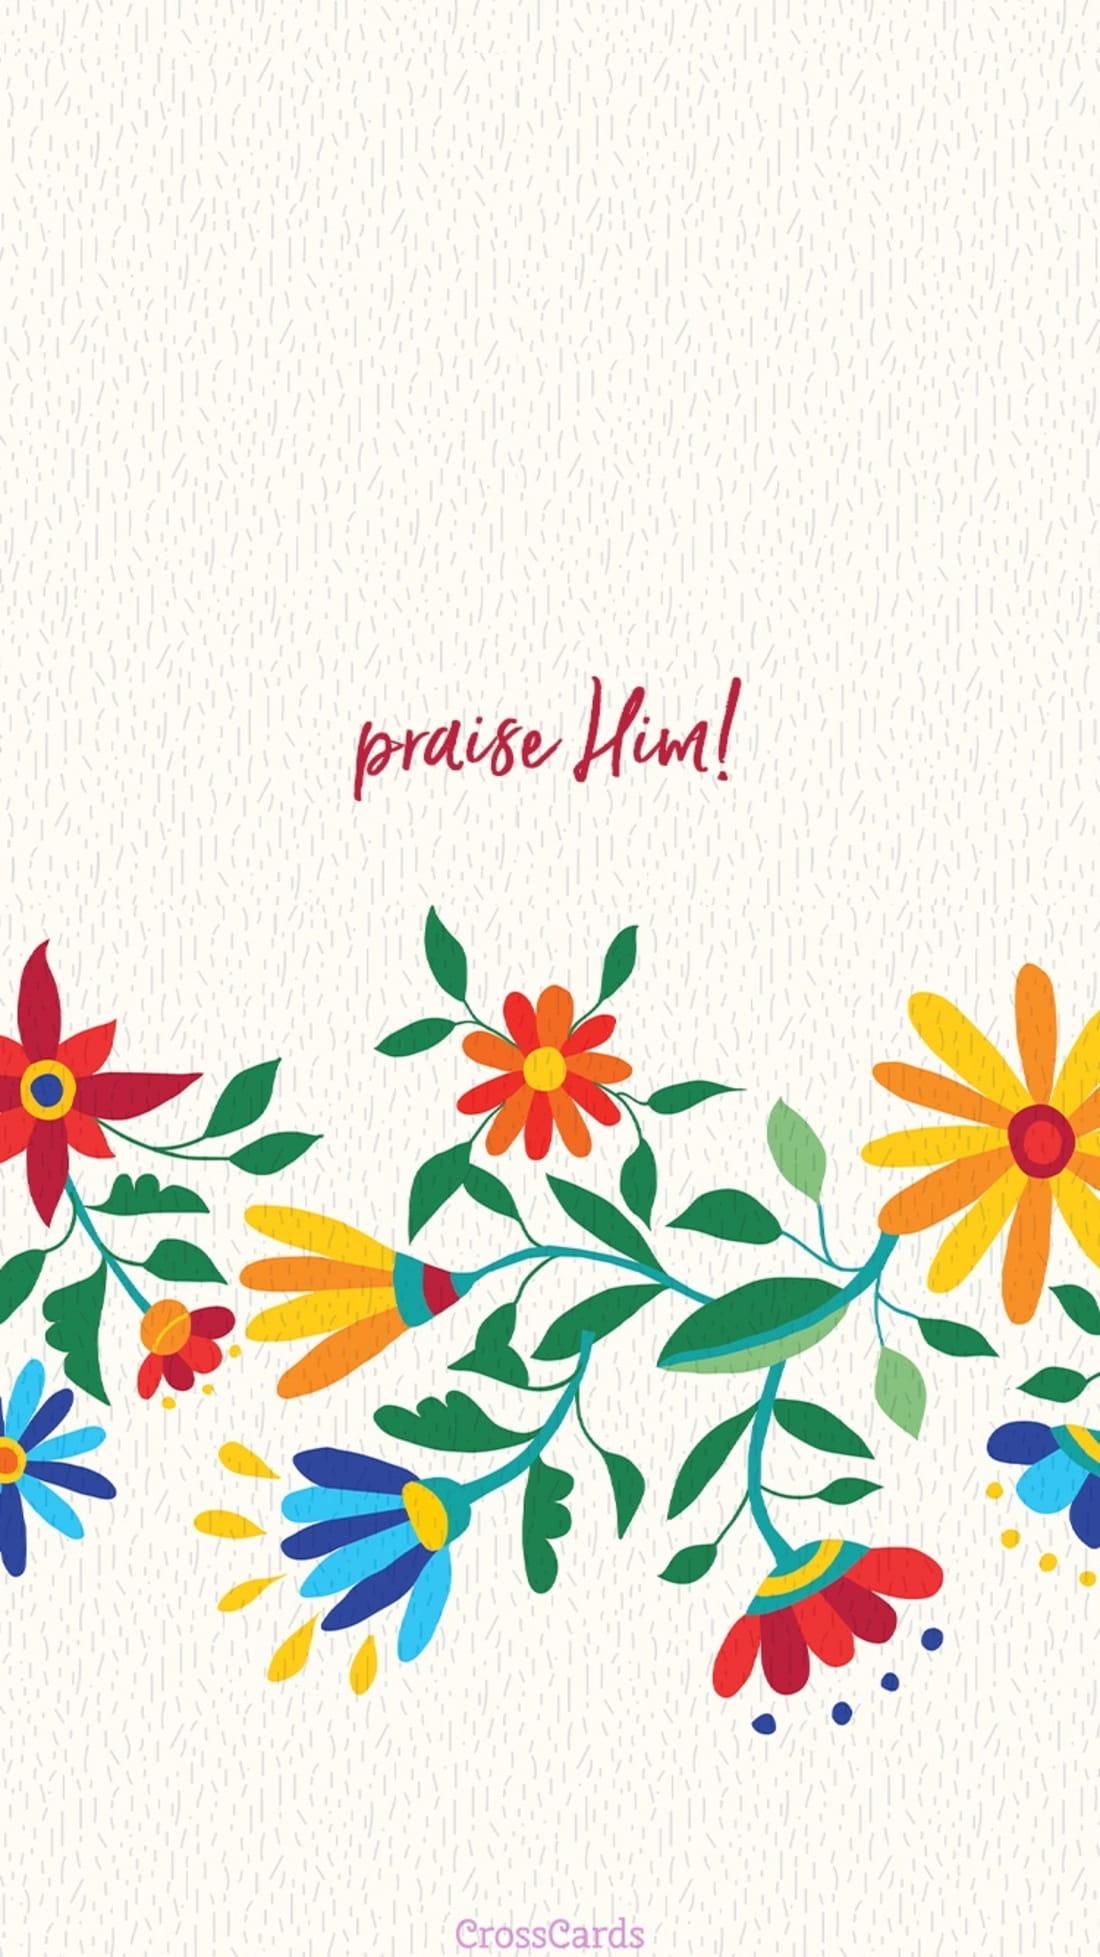 Praise HIM! mobile phone wallpaper